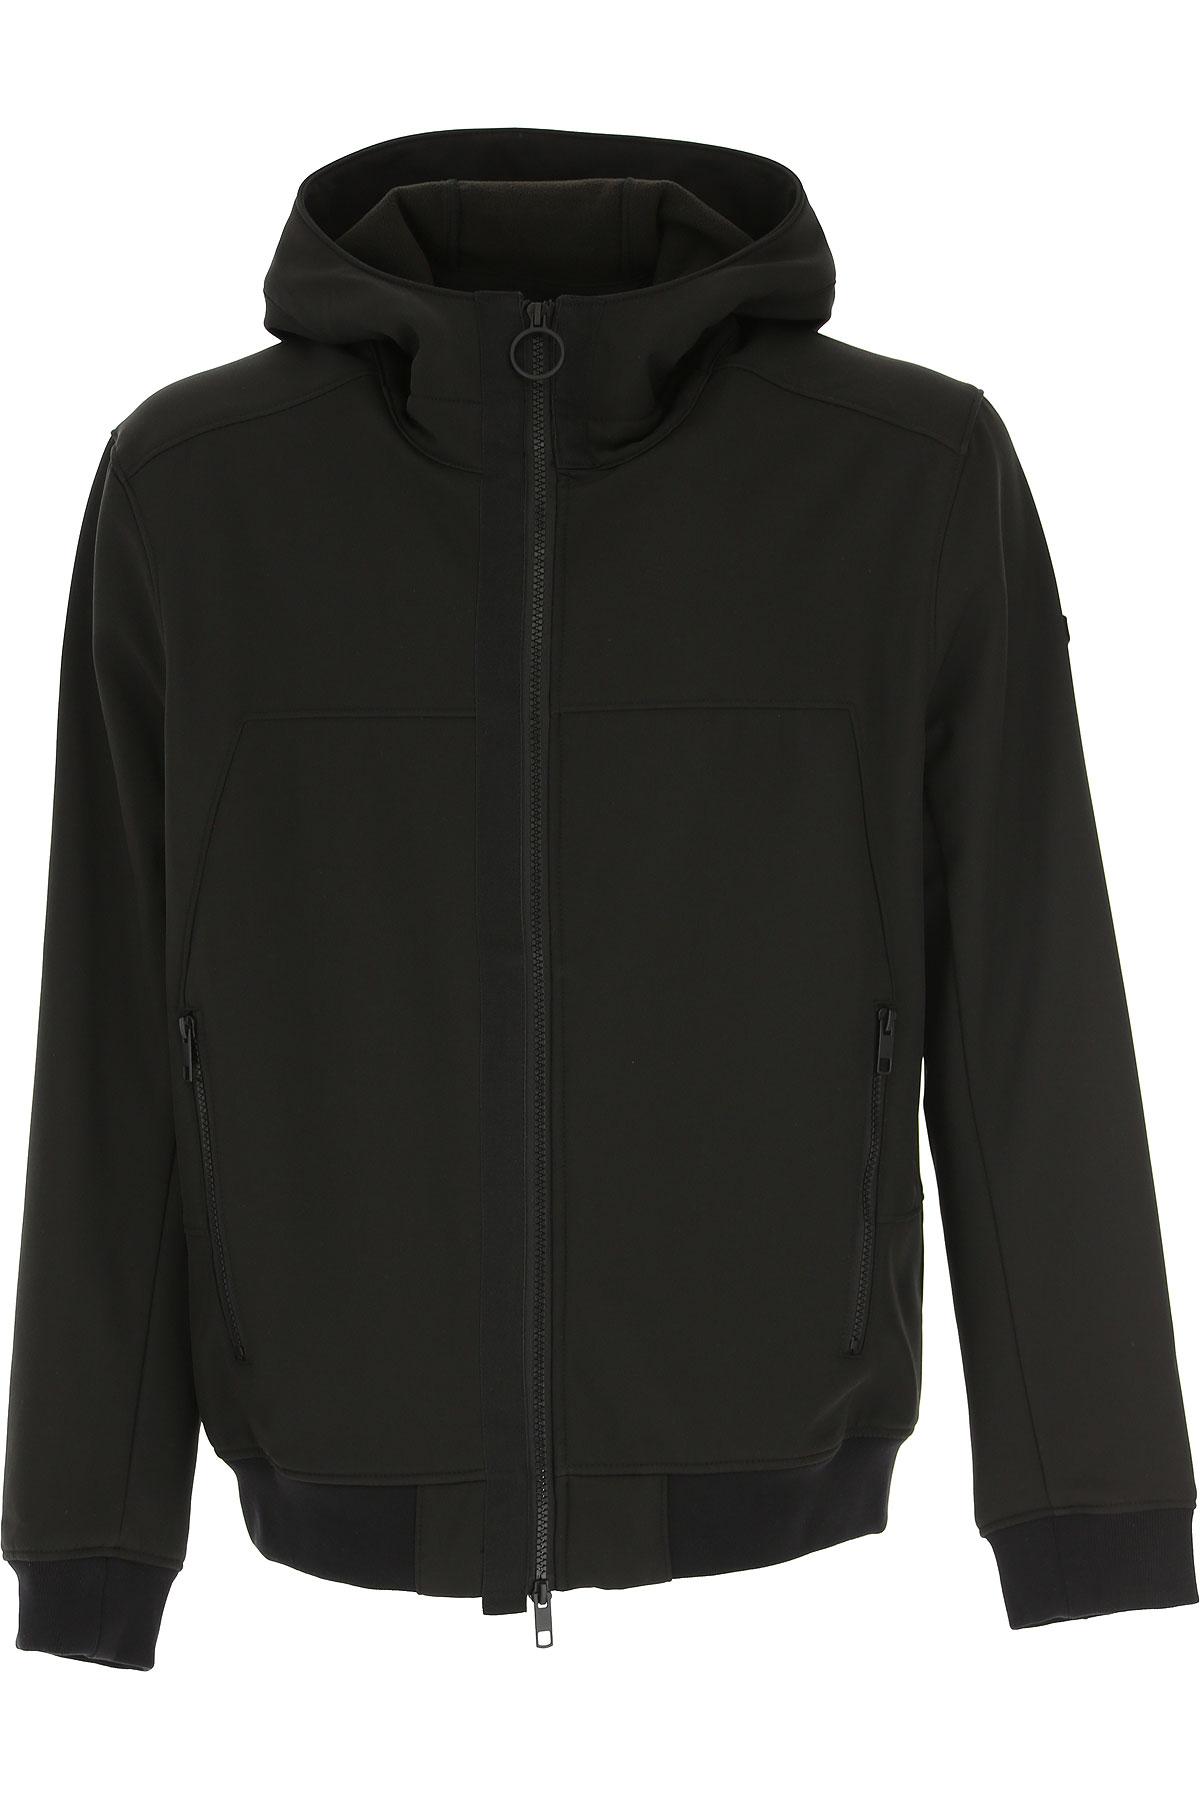 Antony Morato Jacket for Men On Sale, Black, polyamide, 2019, L M S XL